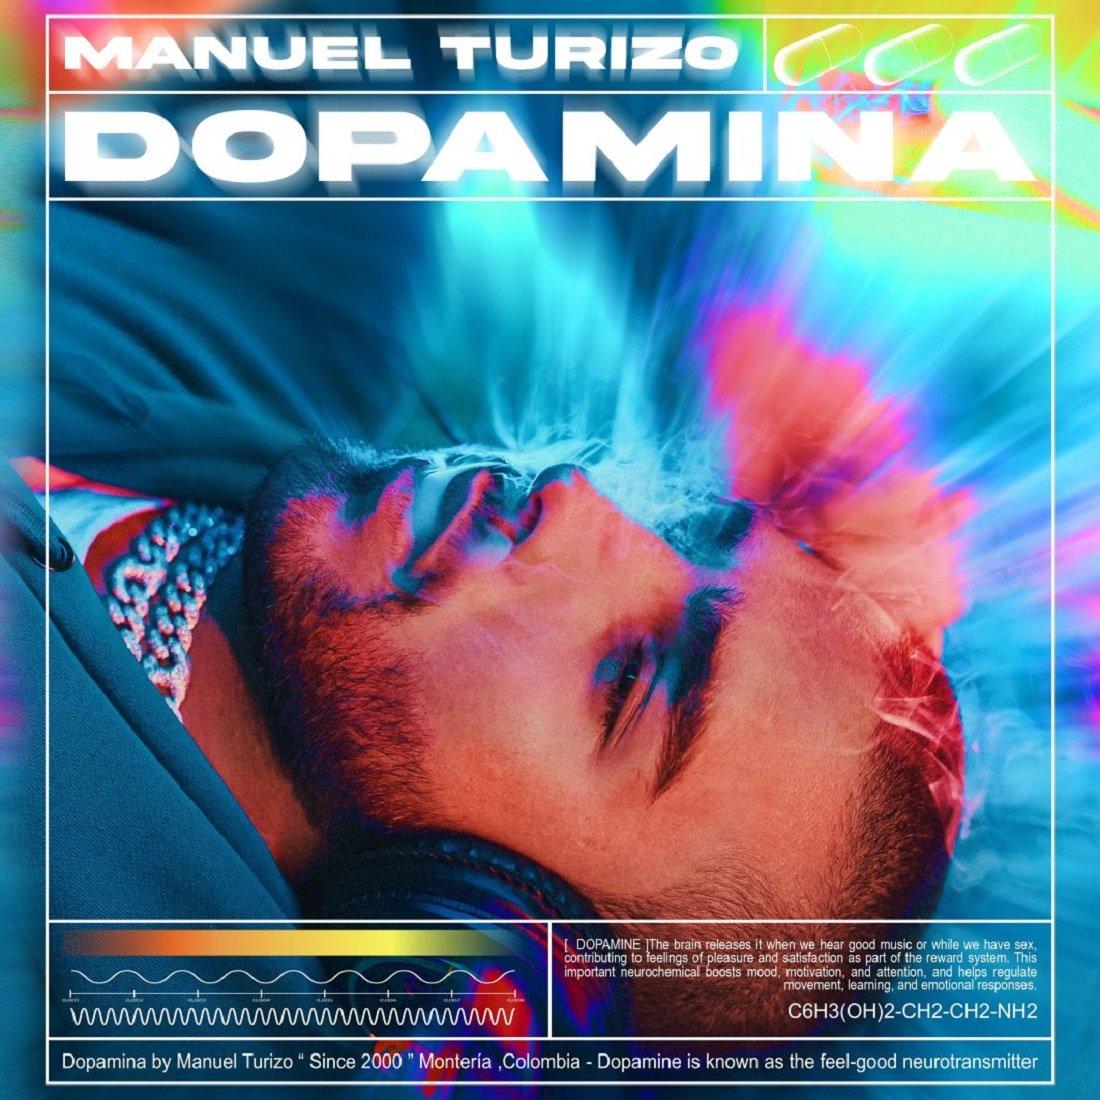 Manuel Turizo x Maluma Amor En Coma